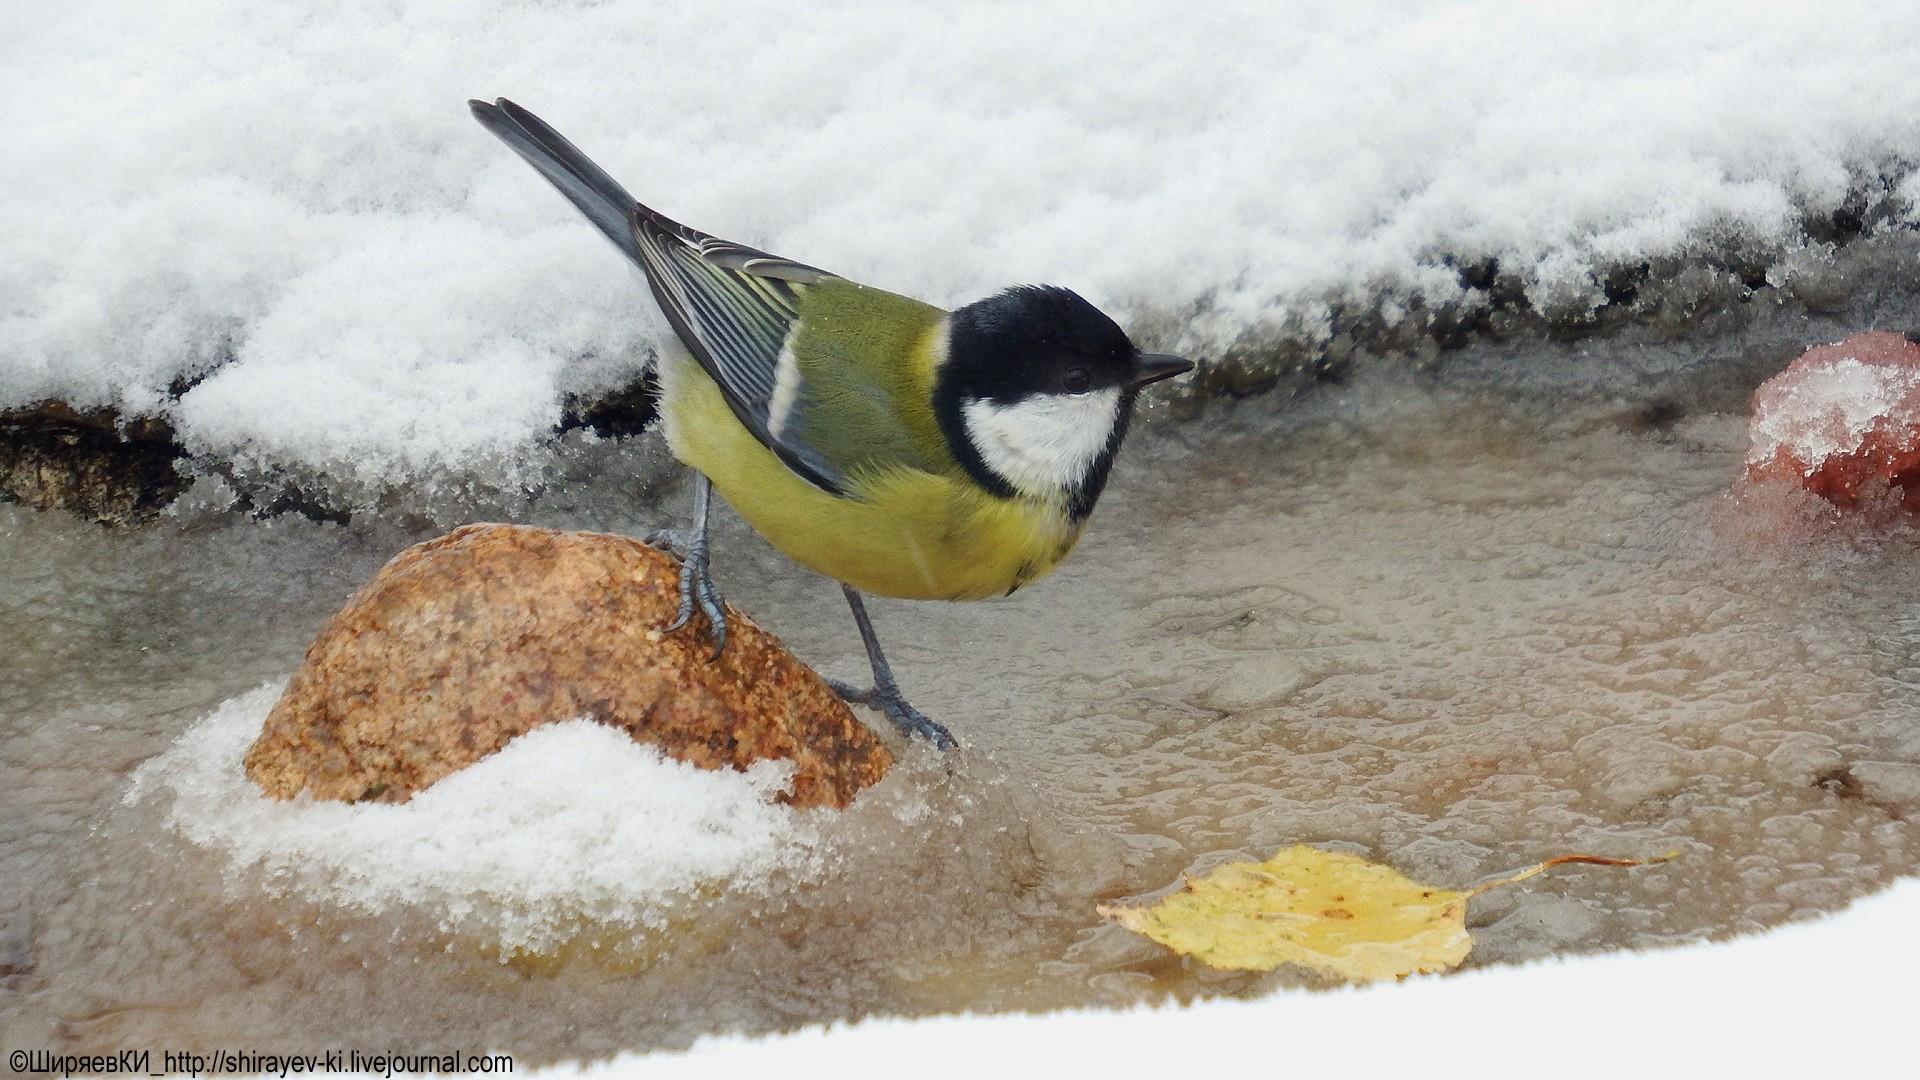 Большая синица (<span class=wiki><a class=bird target=catalog href=http://mycoweb.ru/GIF/catalog/bird_catalog.php?level=picture&id=3>Parus major</a></span>) Автор фото: Константин Ширяев